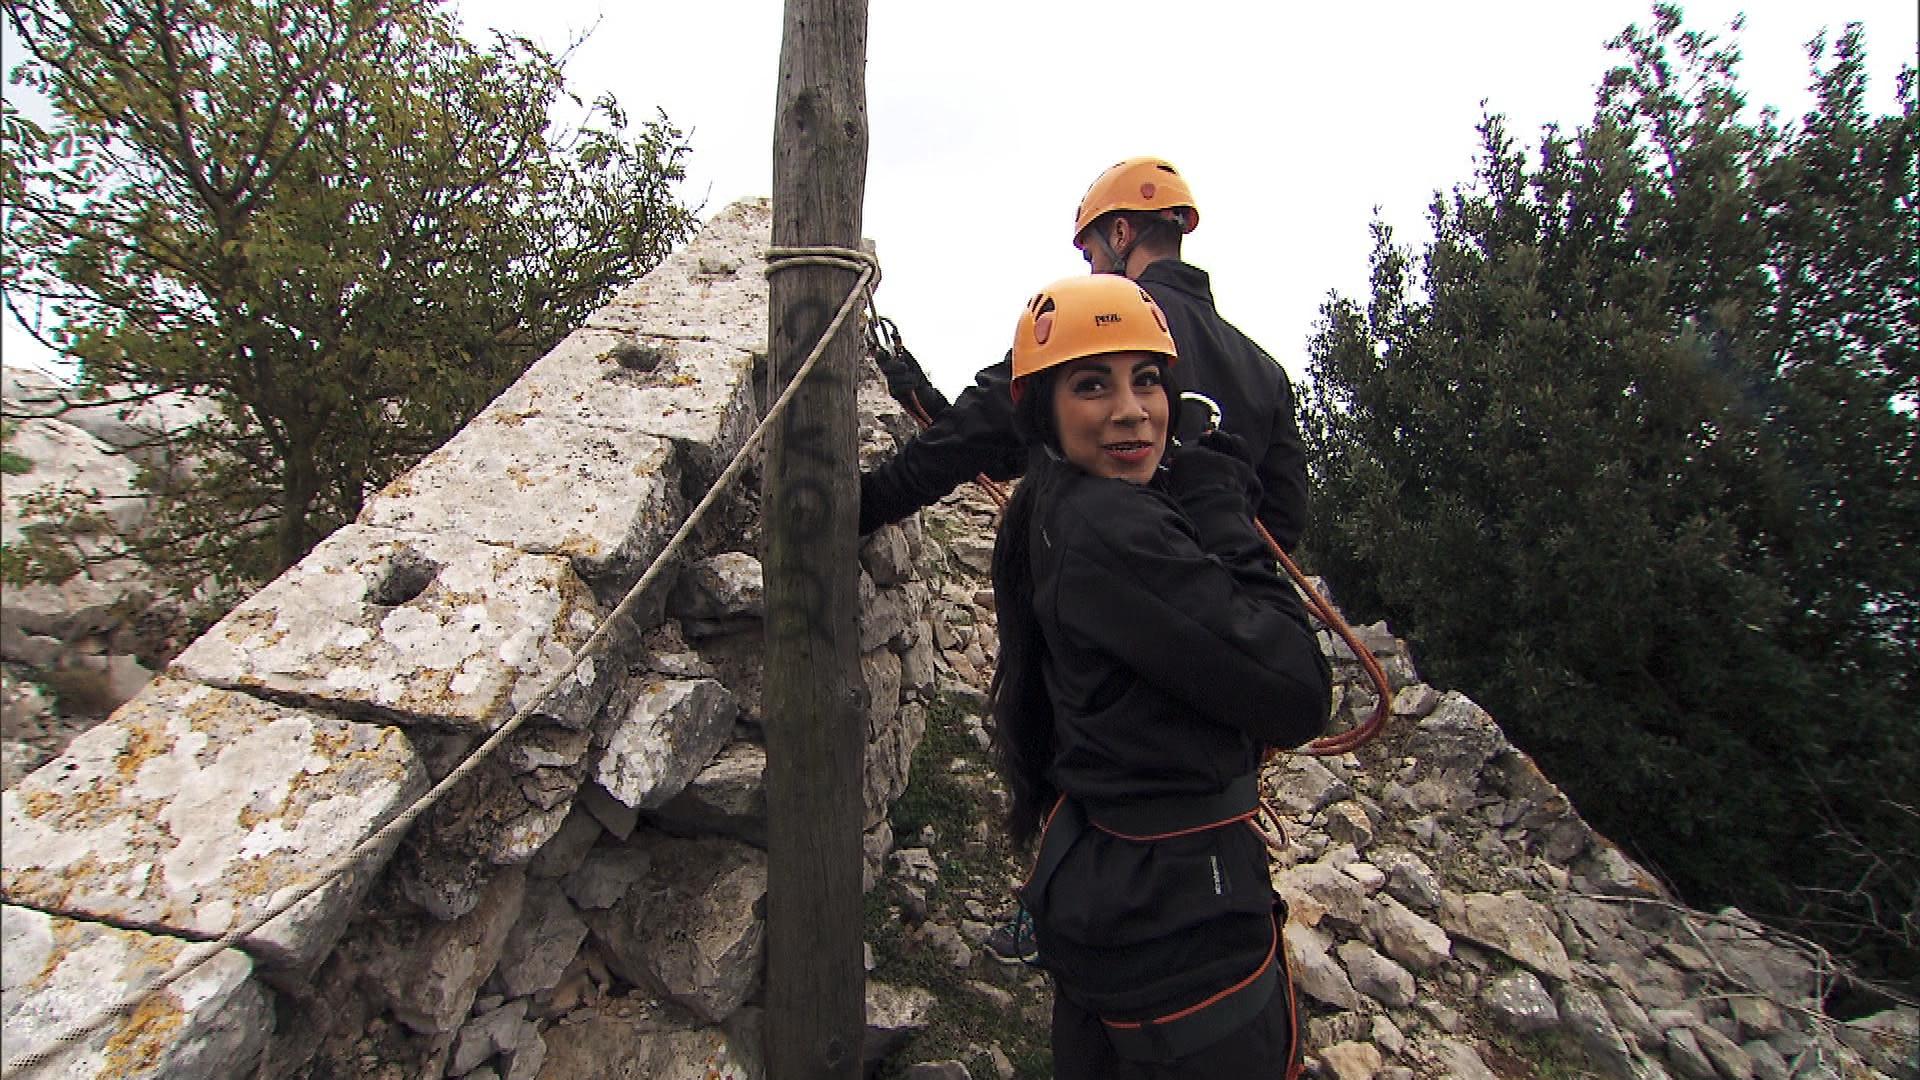 A zip lining adventure